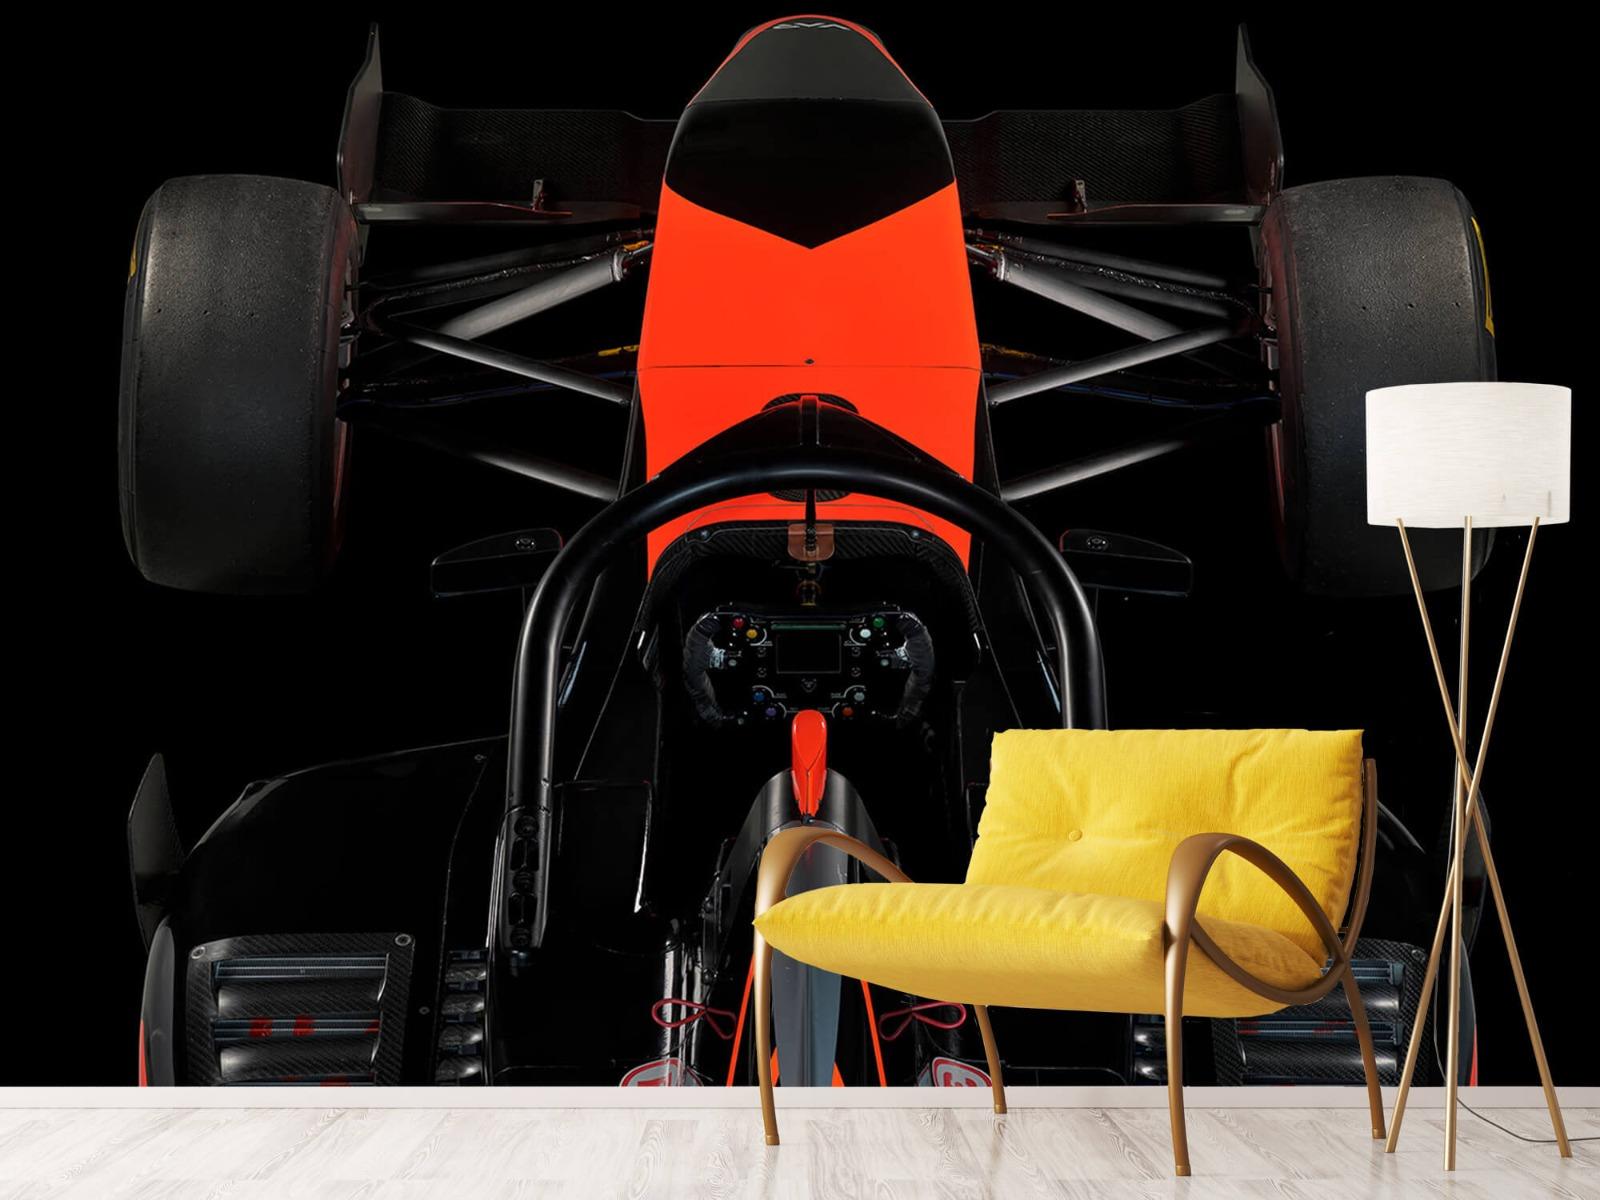 Sportauto's - Formule 3 - Cockpit view - dark - Tienerkamer 10